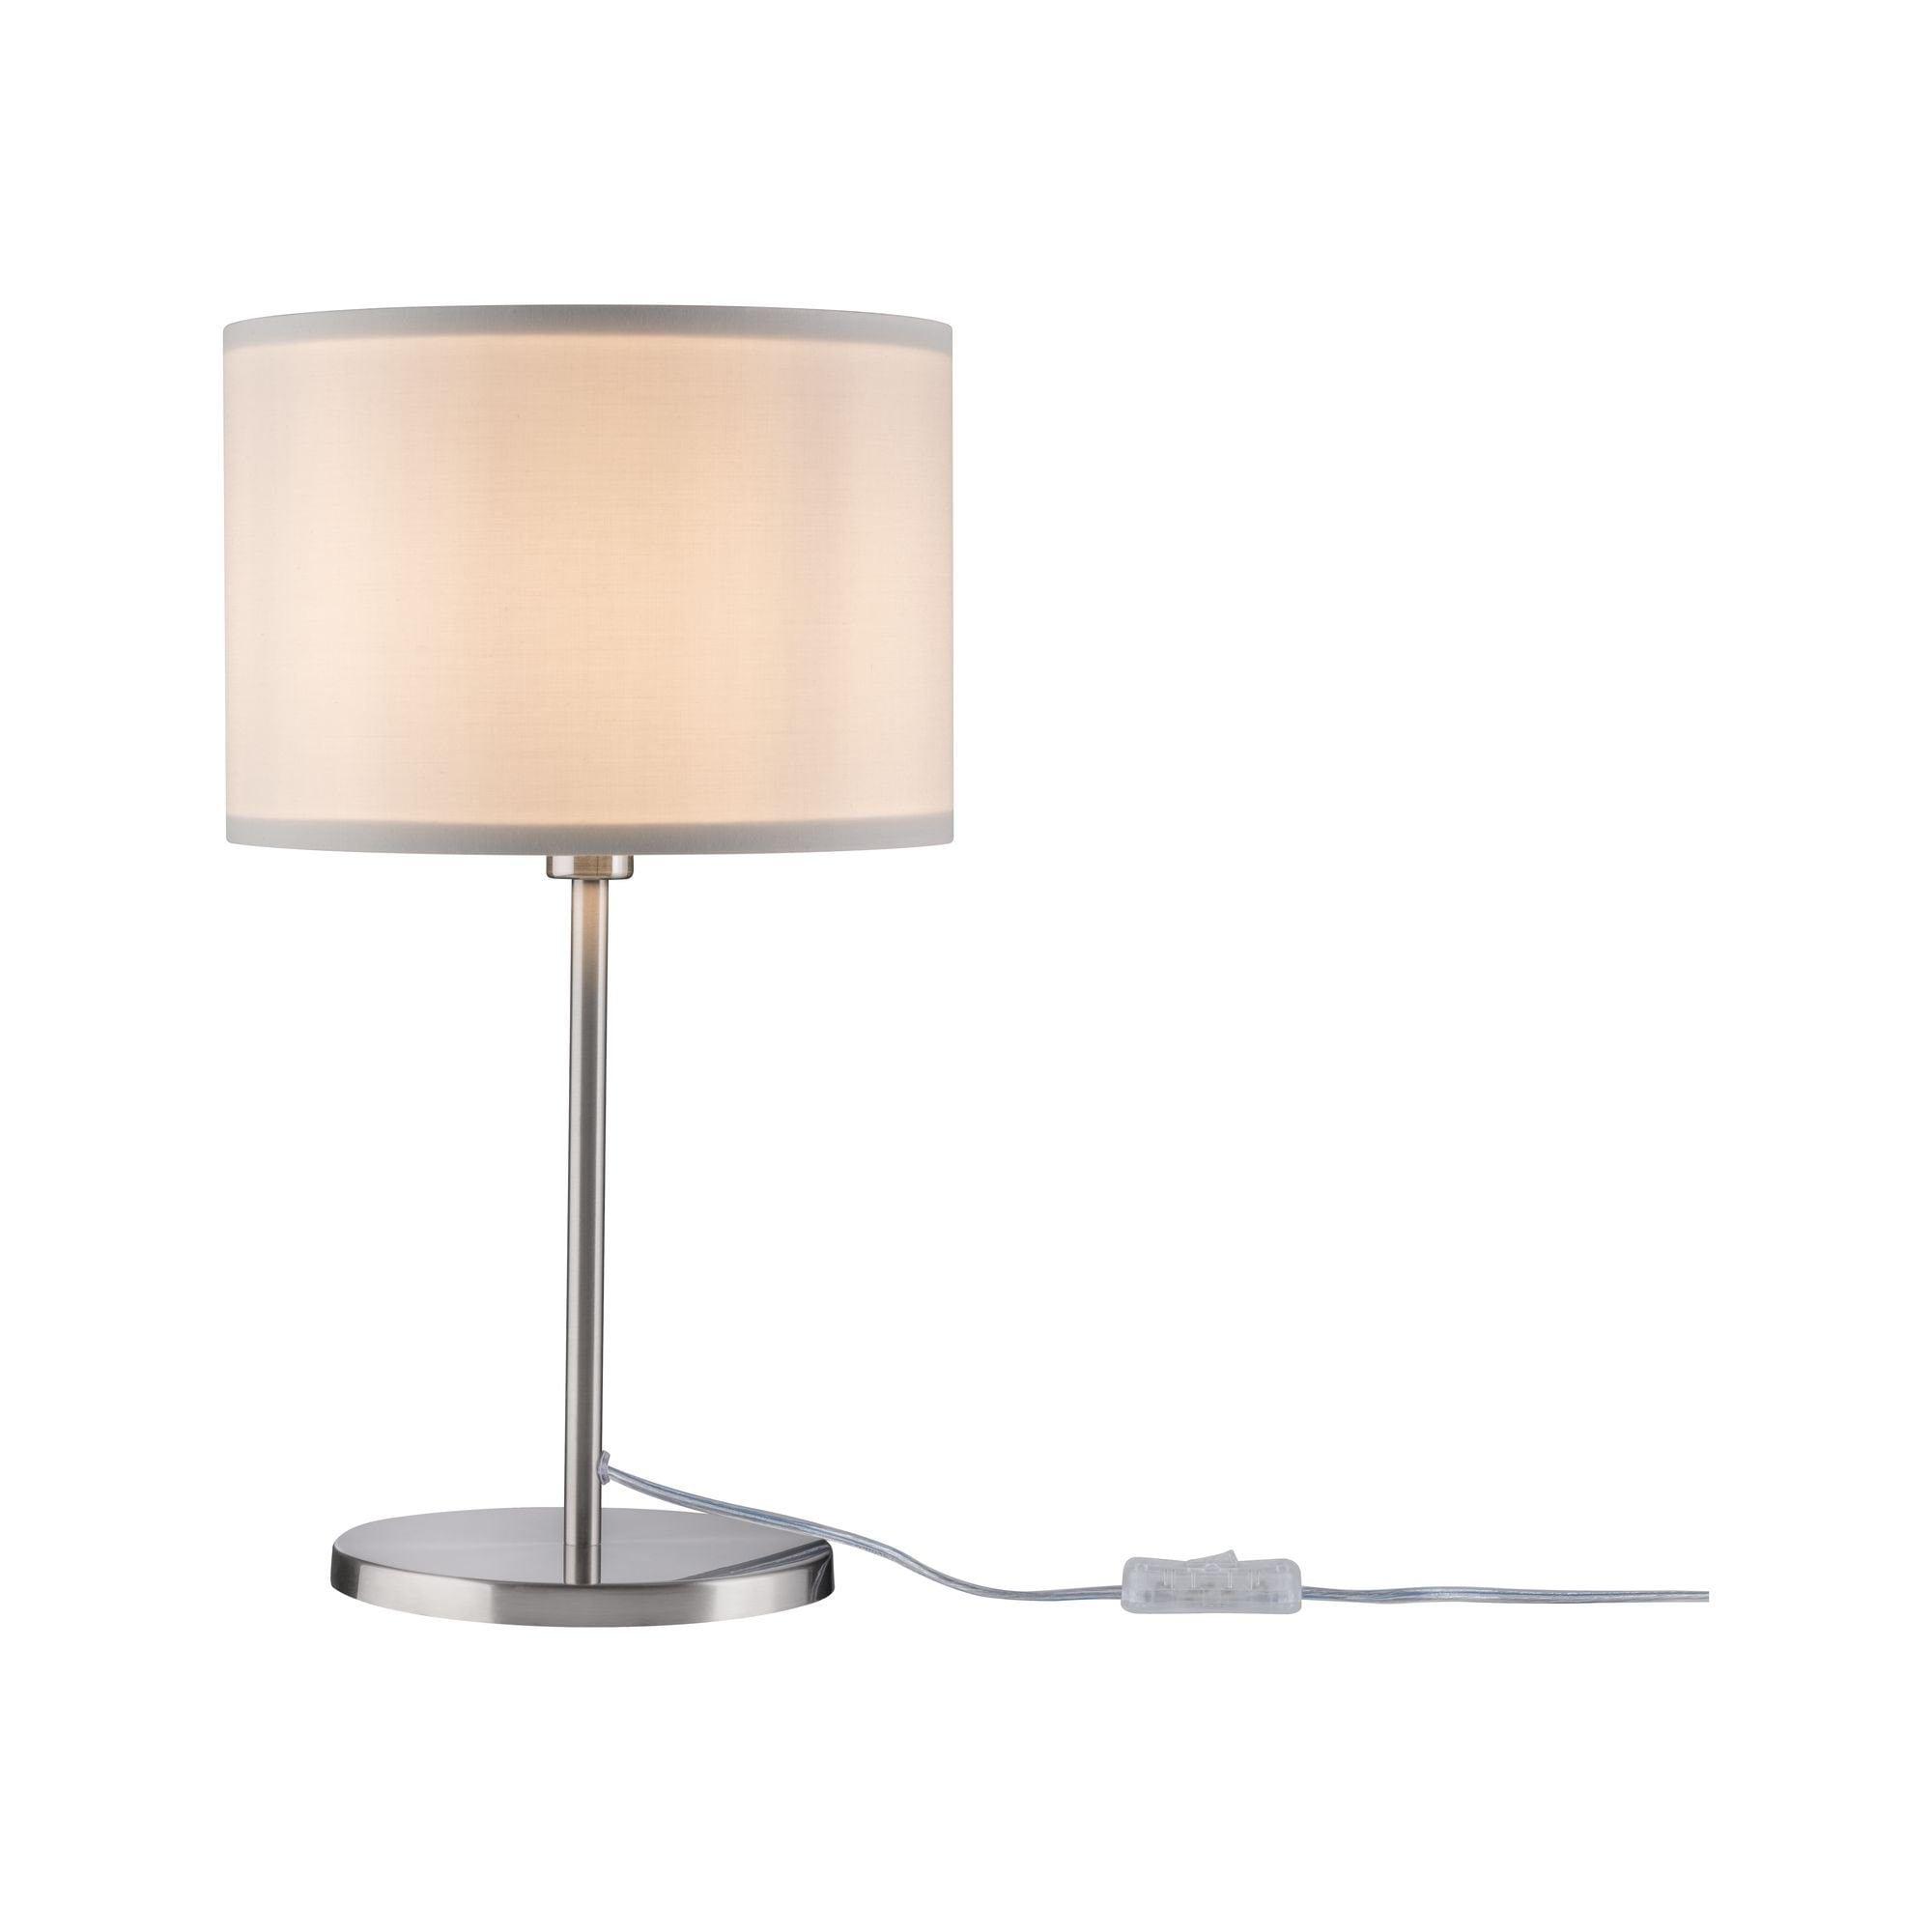 Paulmann LED Tischleuchte Tessa Creme/Eisen gebürstet, max. 40W E14, E14, 1 St.